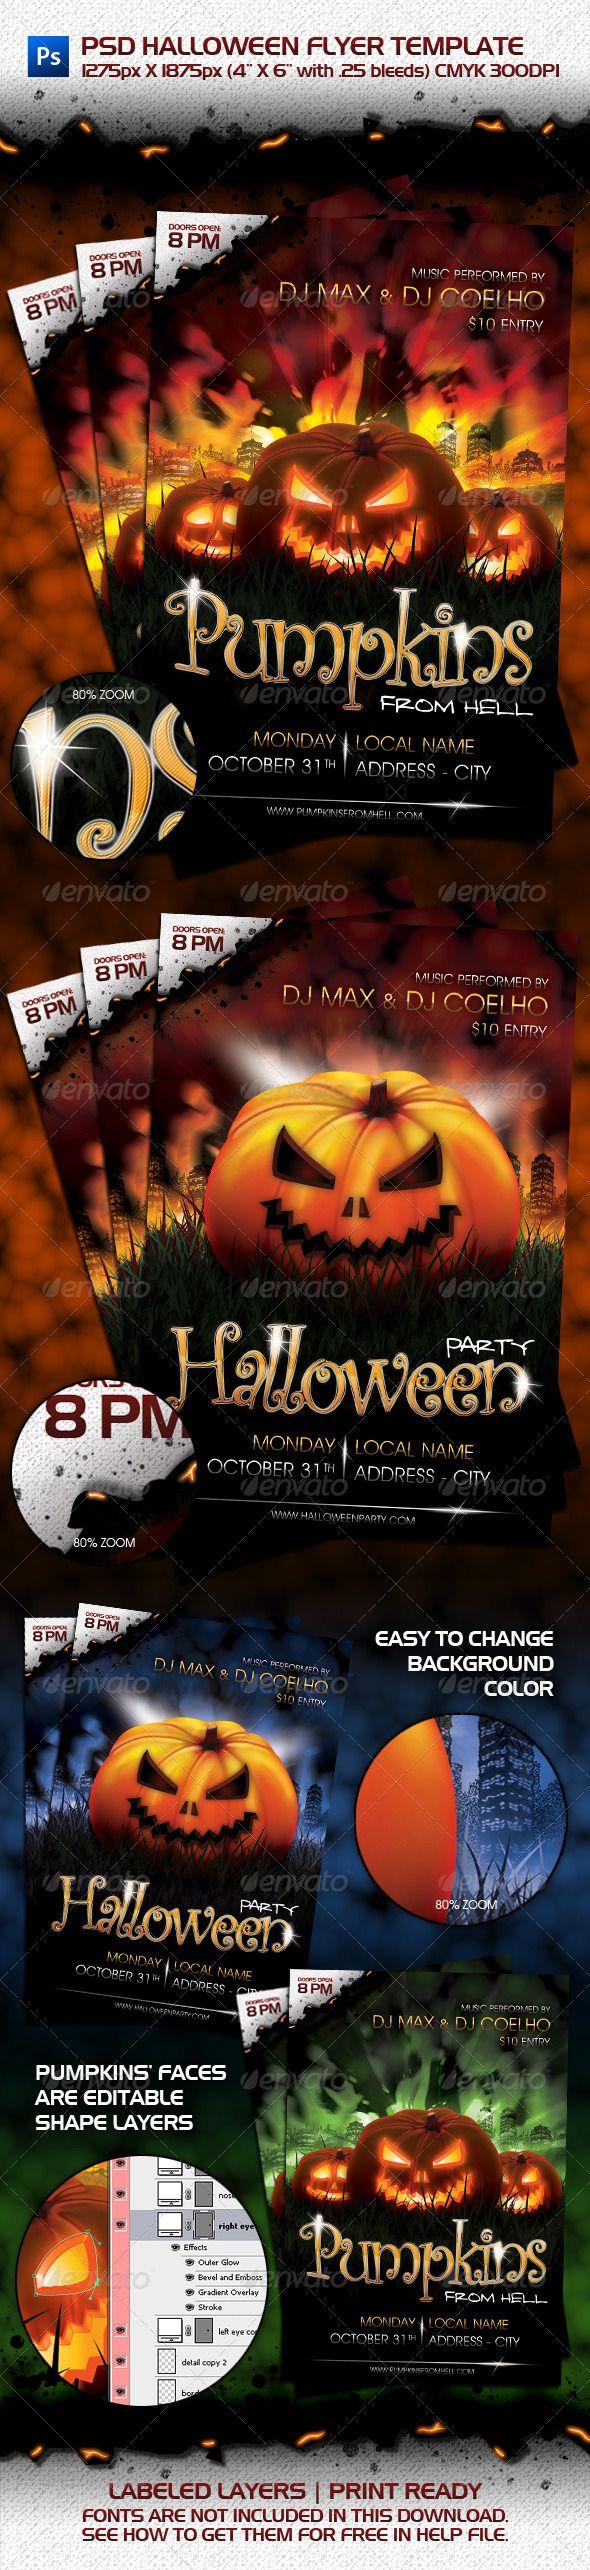 Best 25+ Halloween flyer ideas on Pinterest   Halloween poster ...